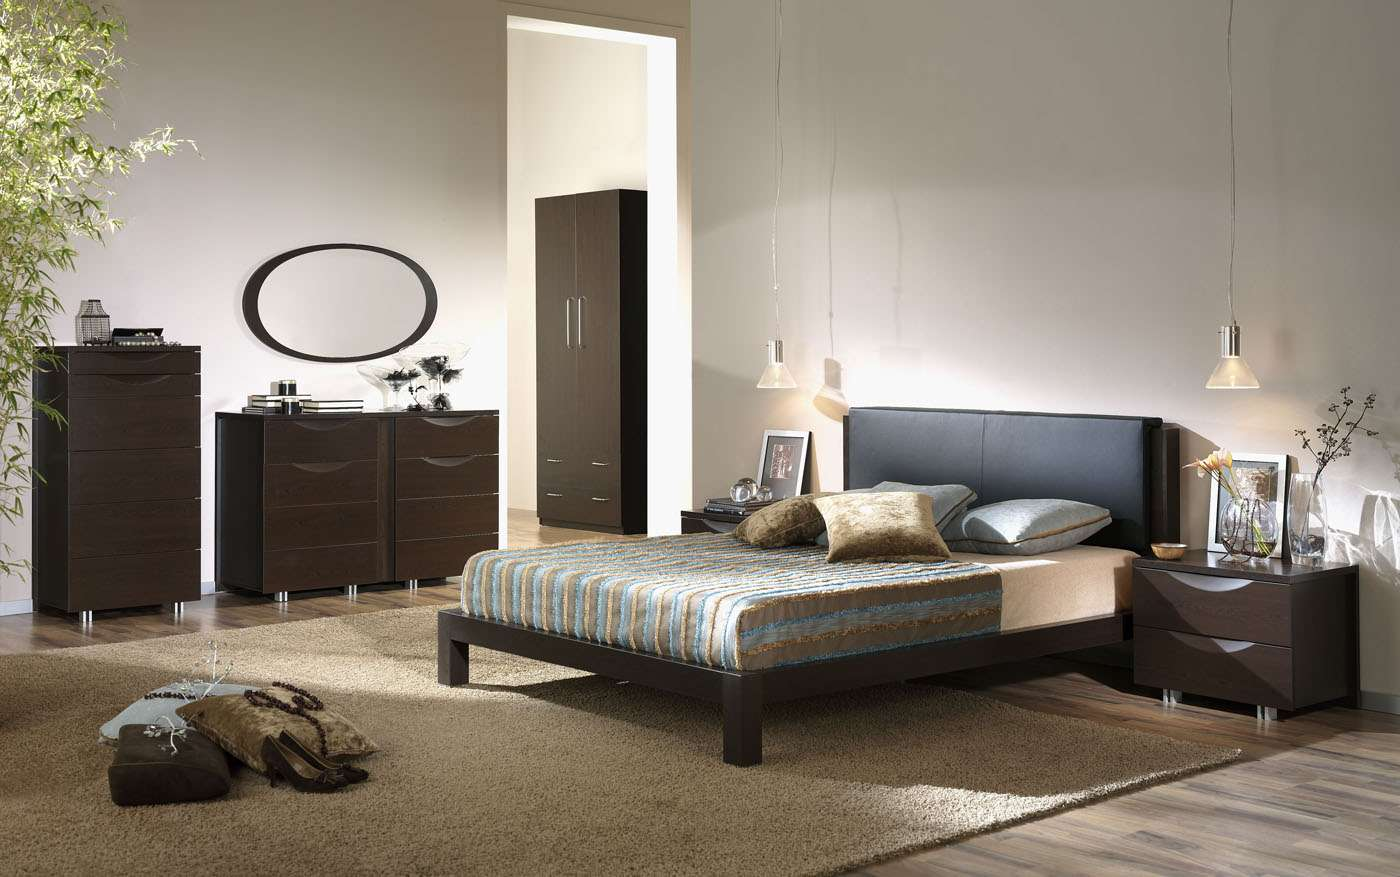 Colour Schemes Bedroom Decor Ideas